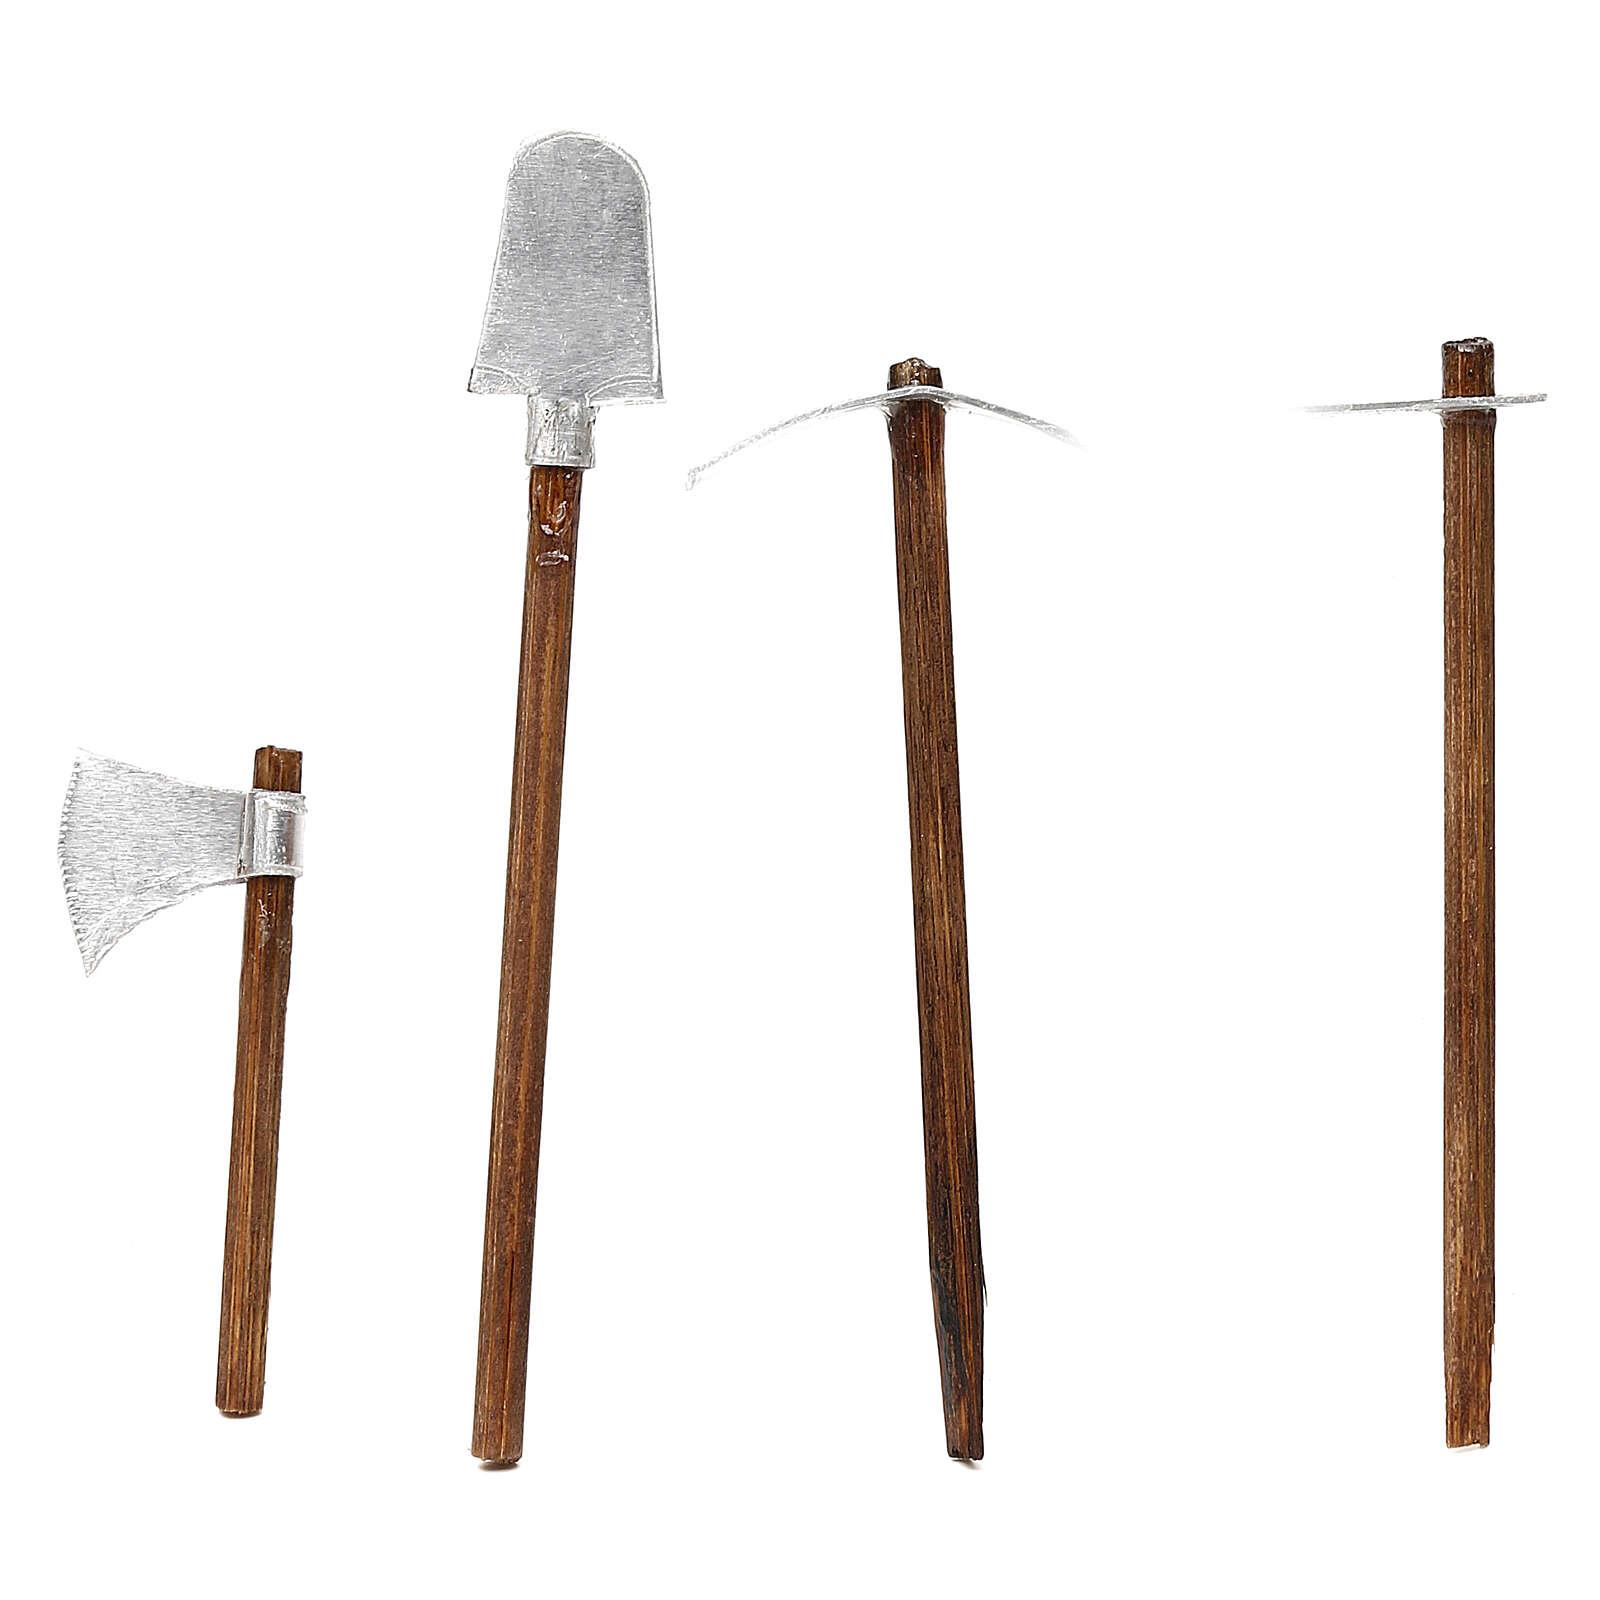 Work tools four models, 8 cm Neapolitan nativity 4